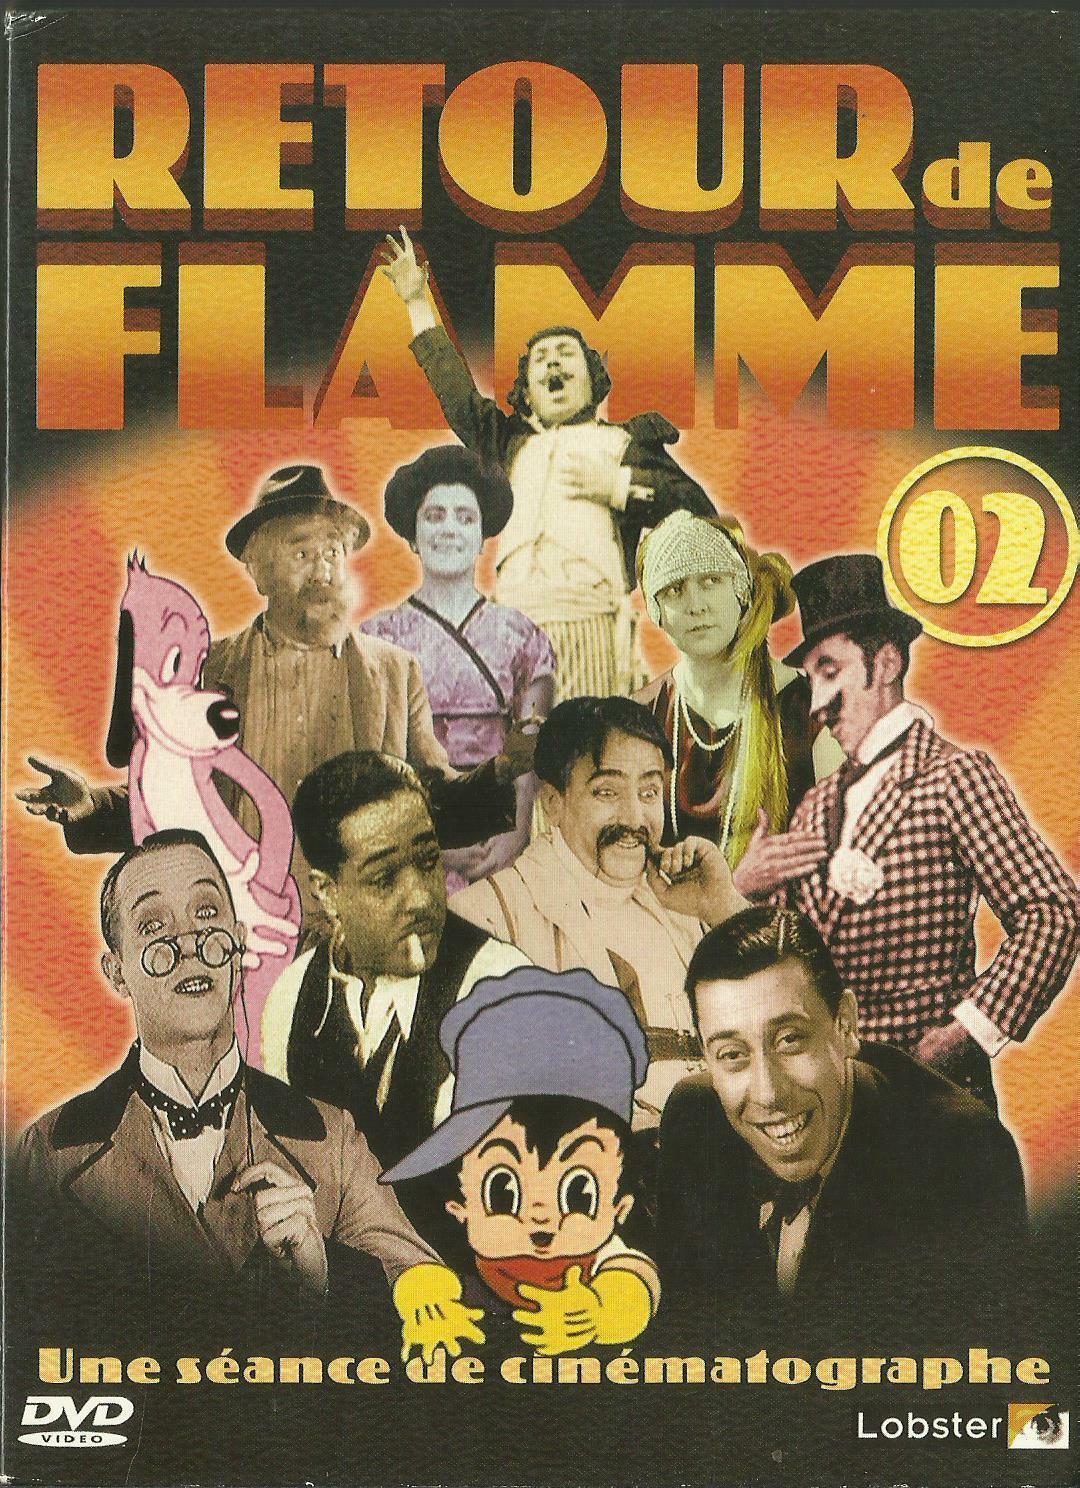 Retour de Flamme: 02